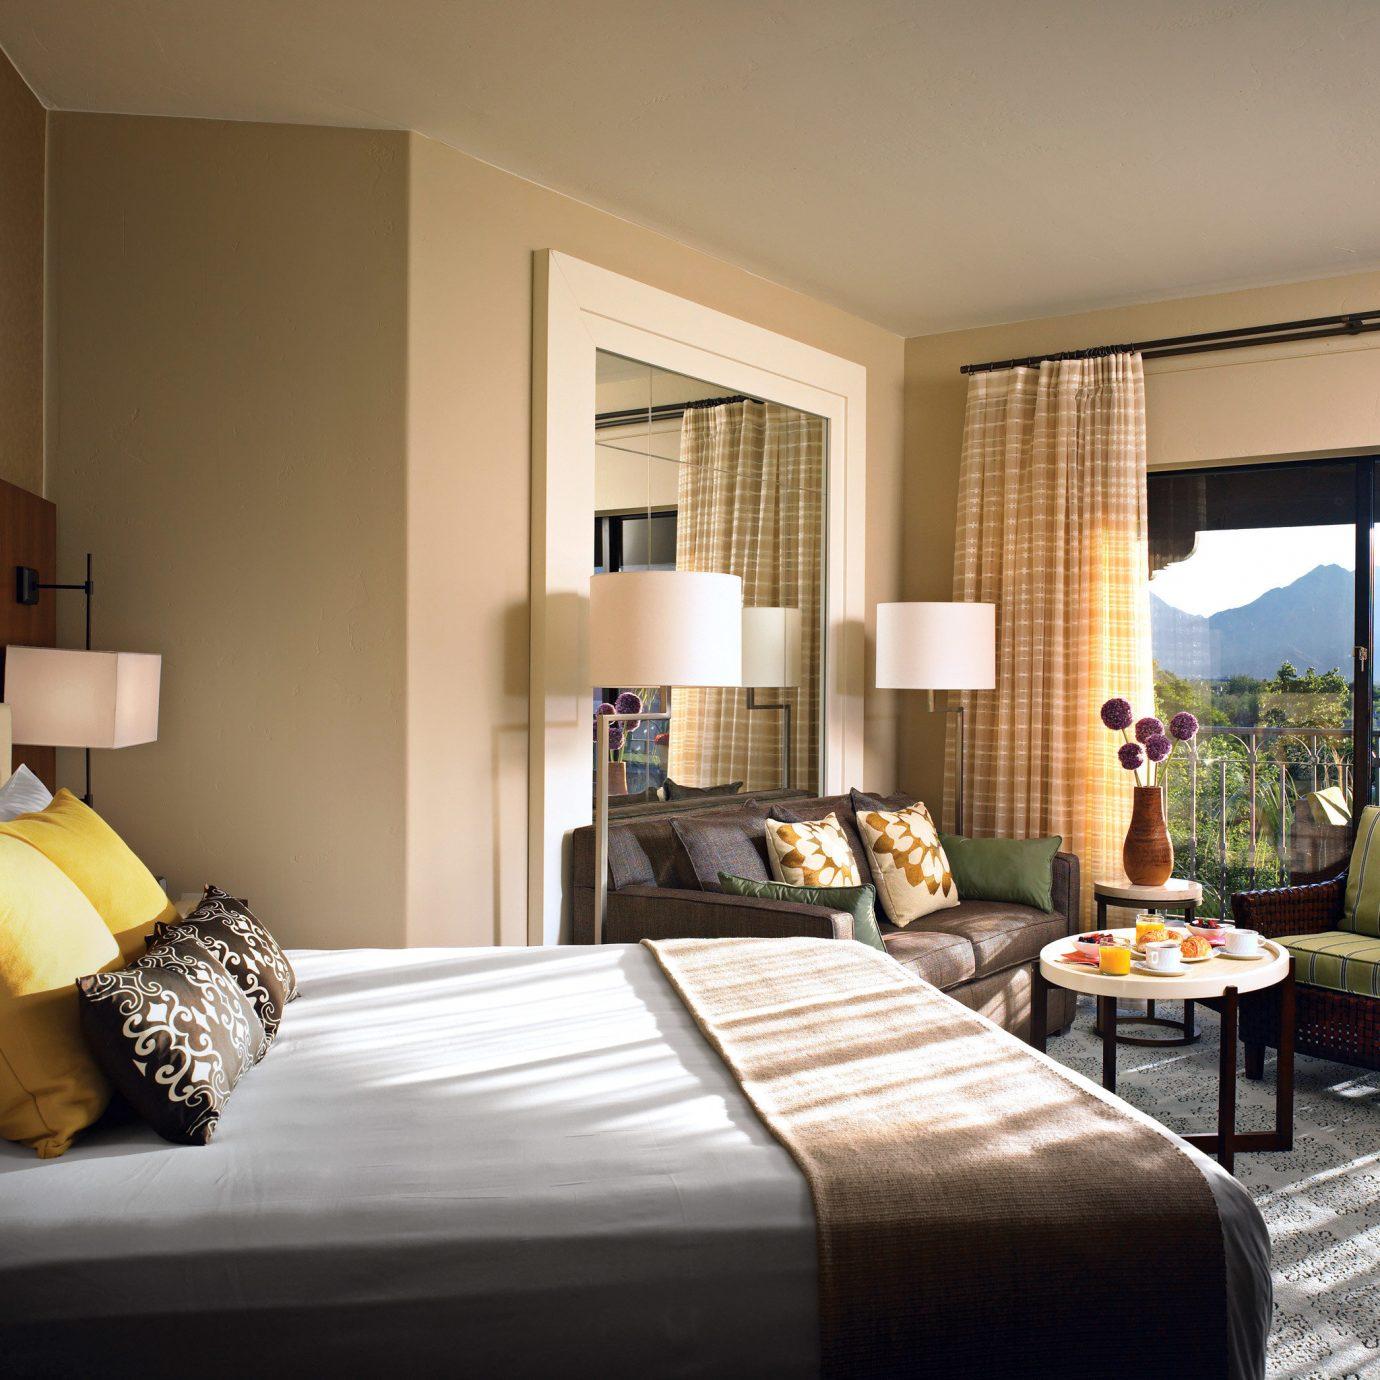 Bedroom Luxury Modern Scenic views Suite sofa property living room condominium home flat